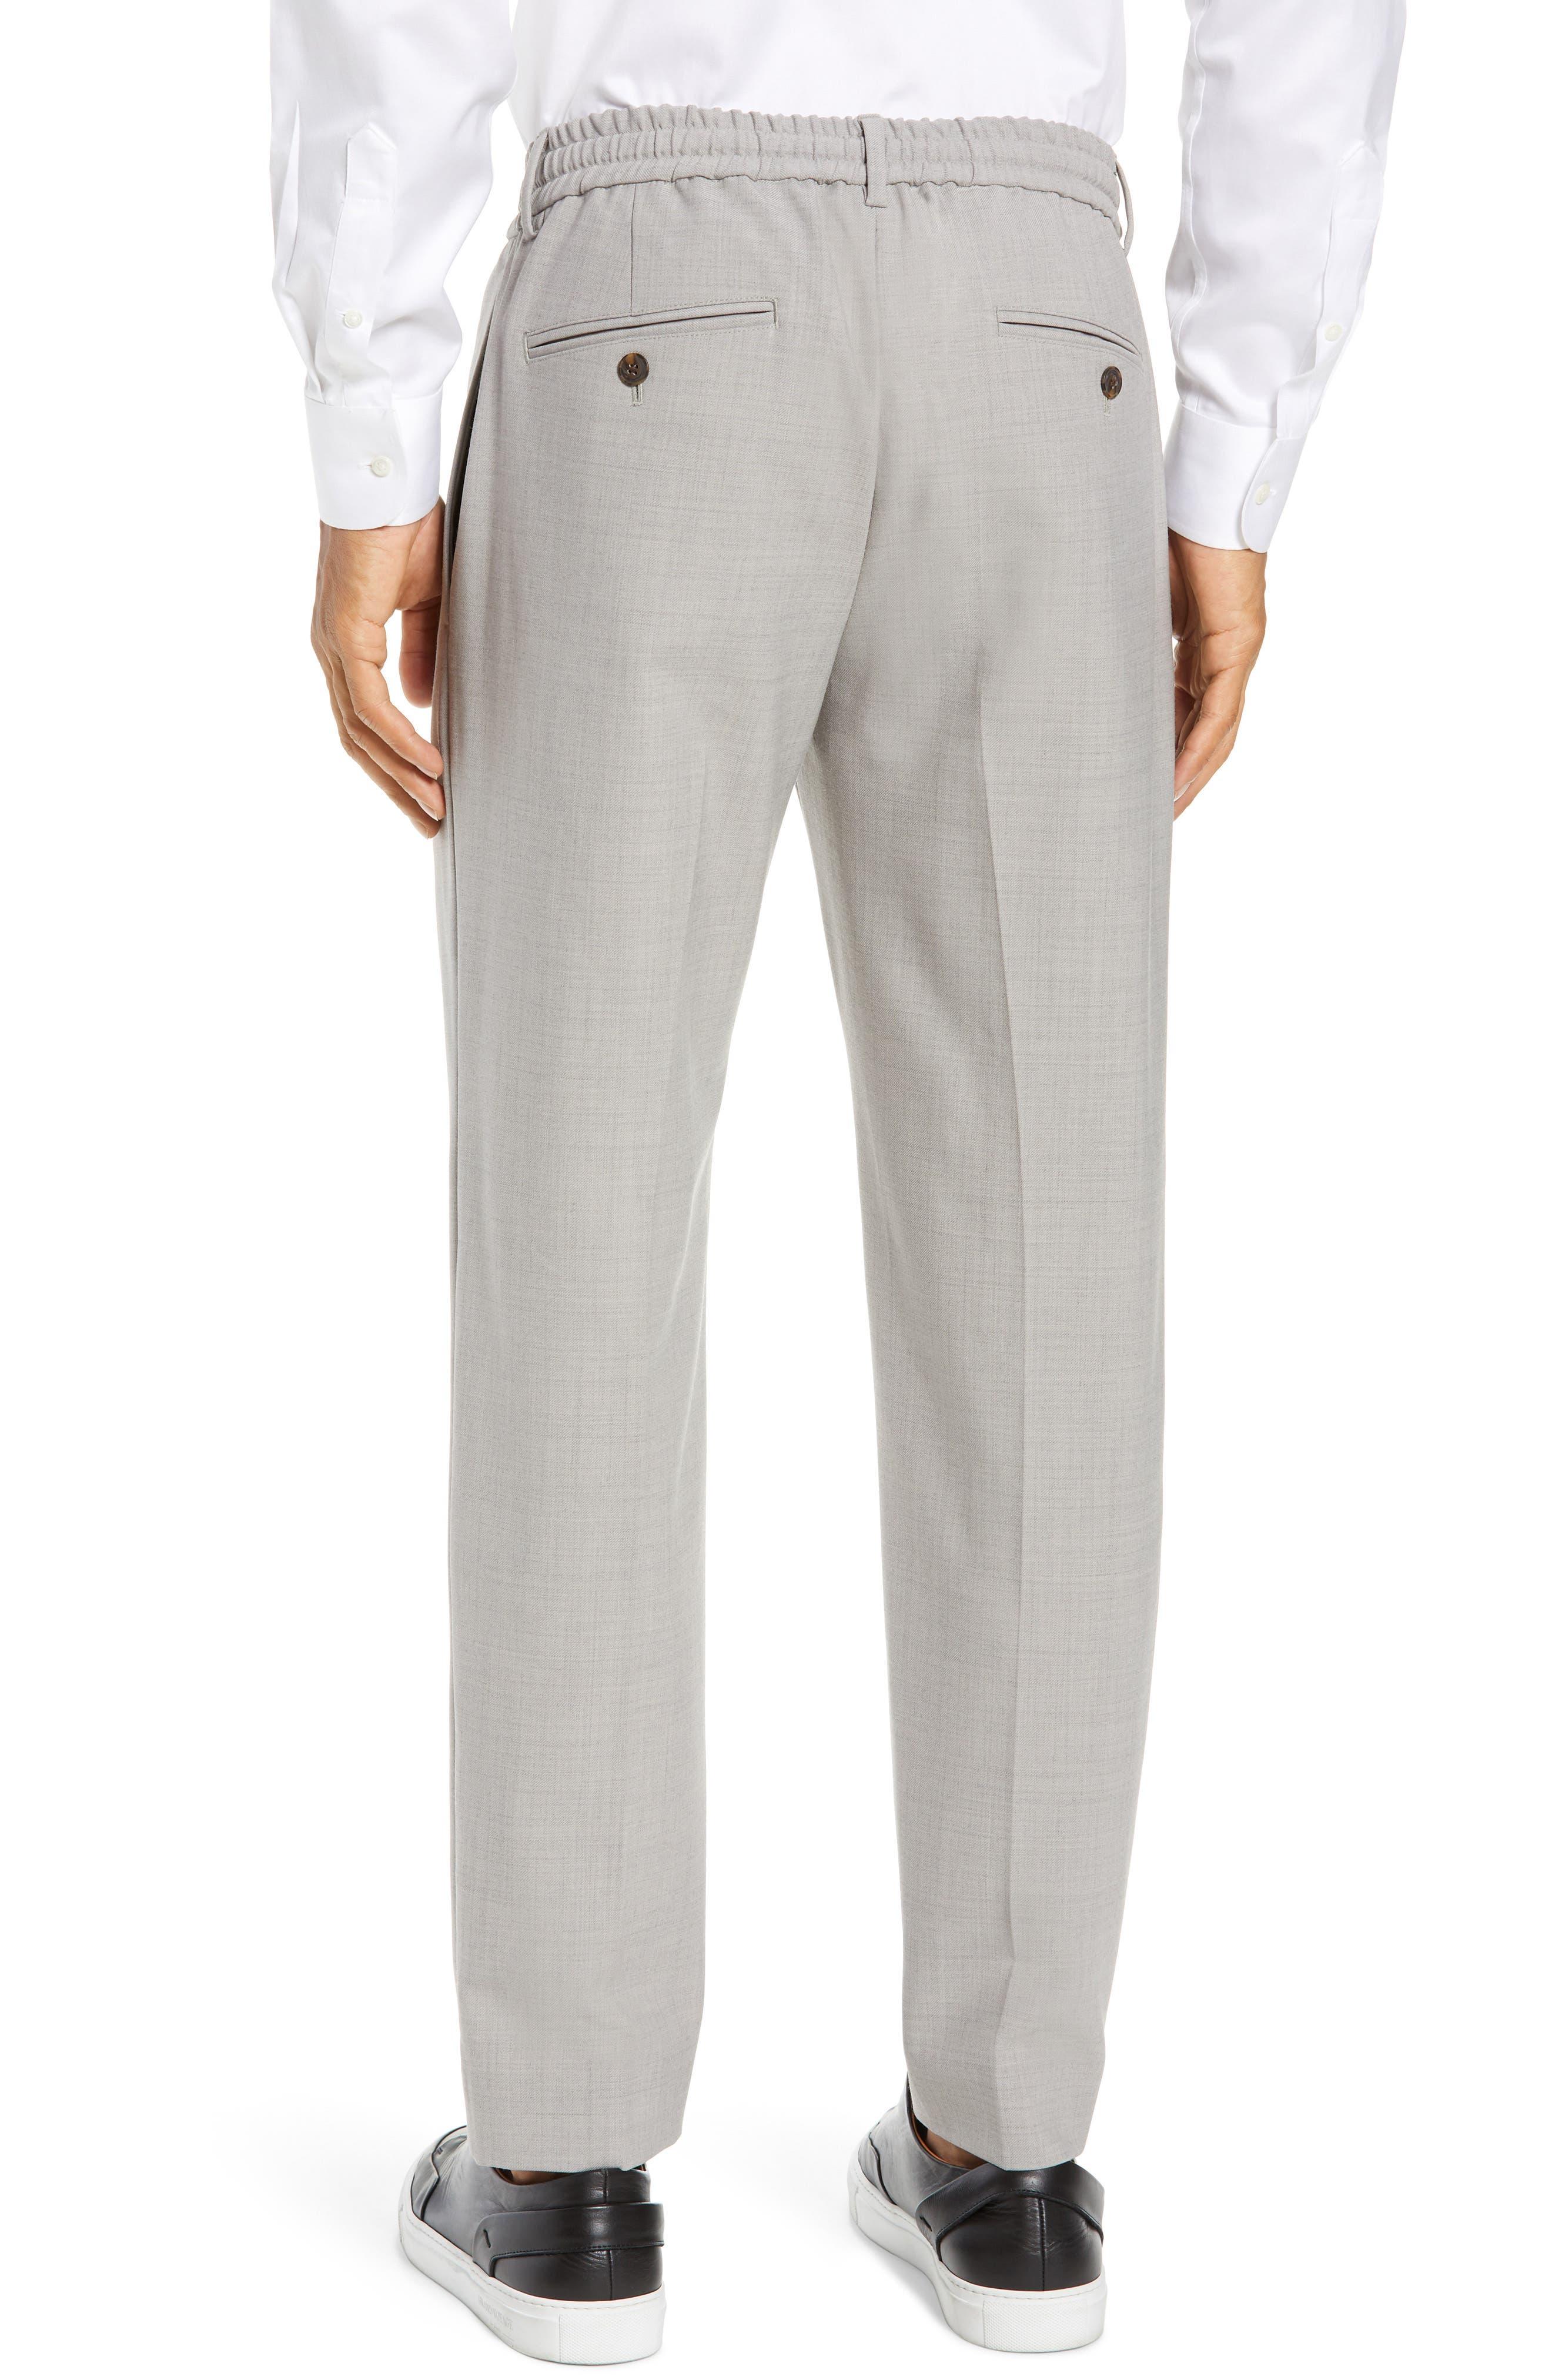 CLUB MONACO,                             Trim Fit Pintuck Pants,                             Alternate thumbnail 2, color,                             HEATHER GREY